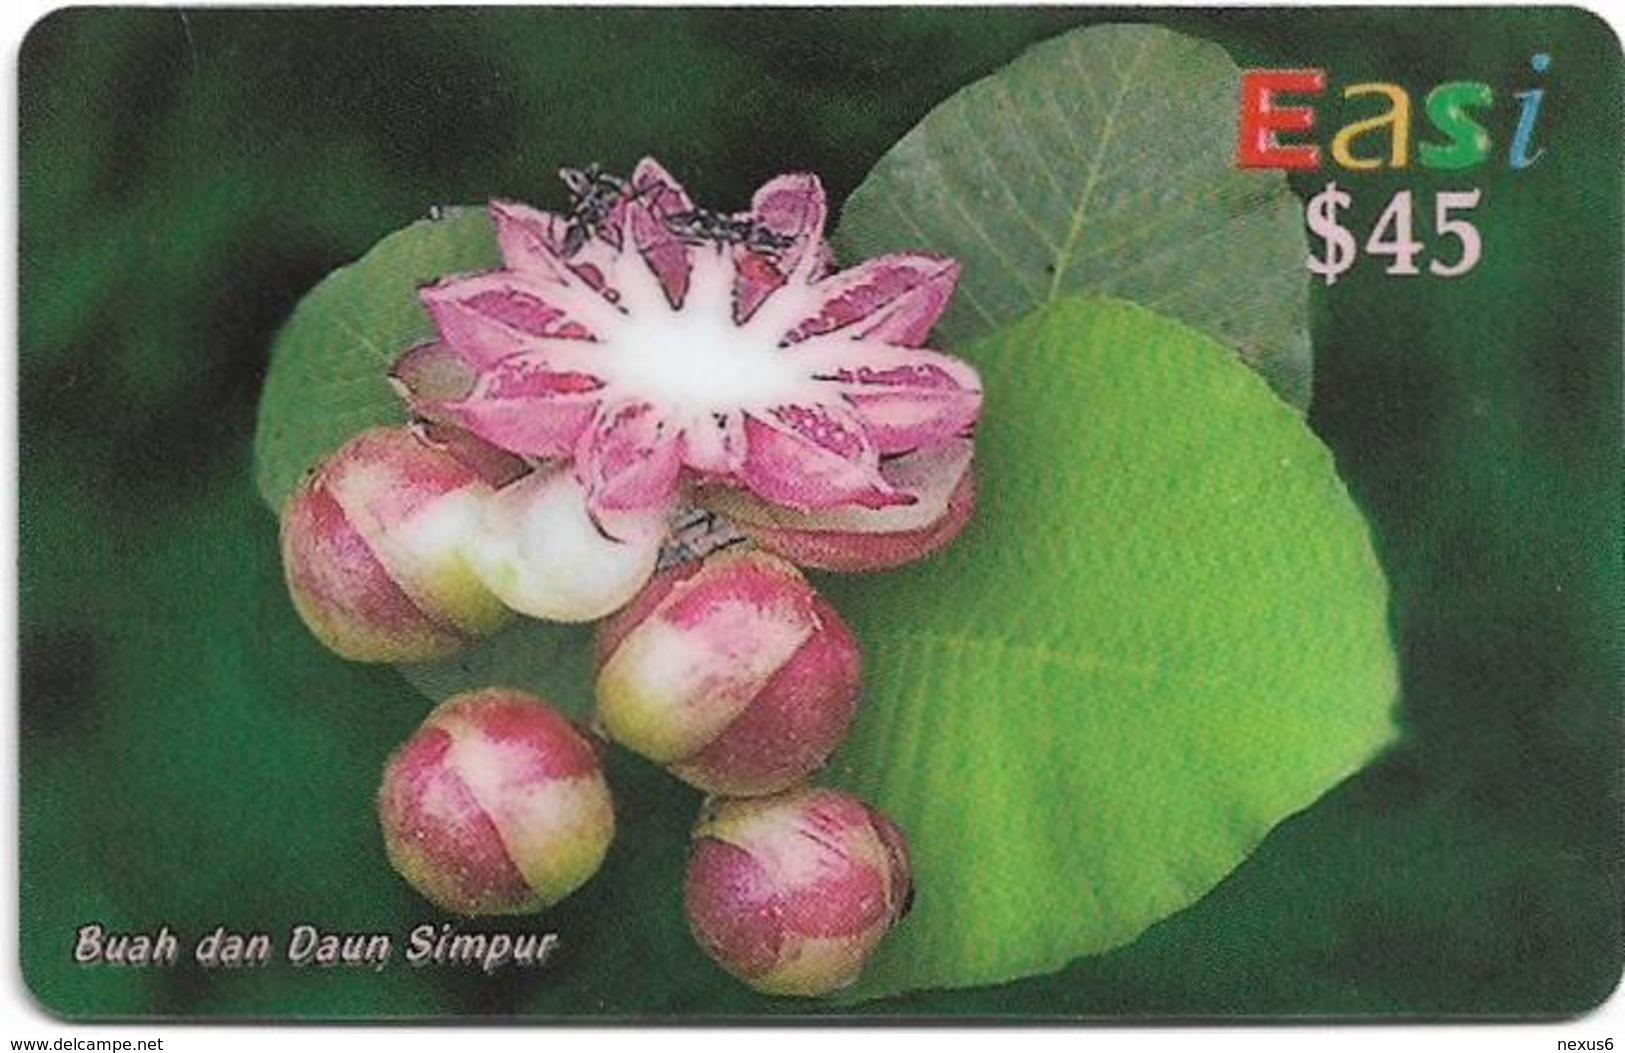 Brunei - DstCom - Easi - Dillenia Suffruticosa Flower, Prepaid 45$, Used - Brunei